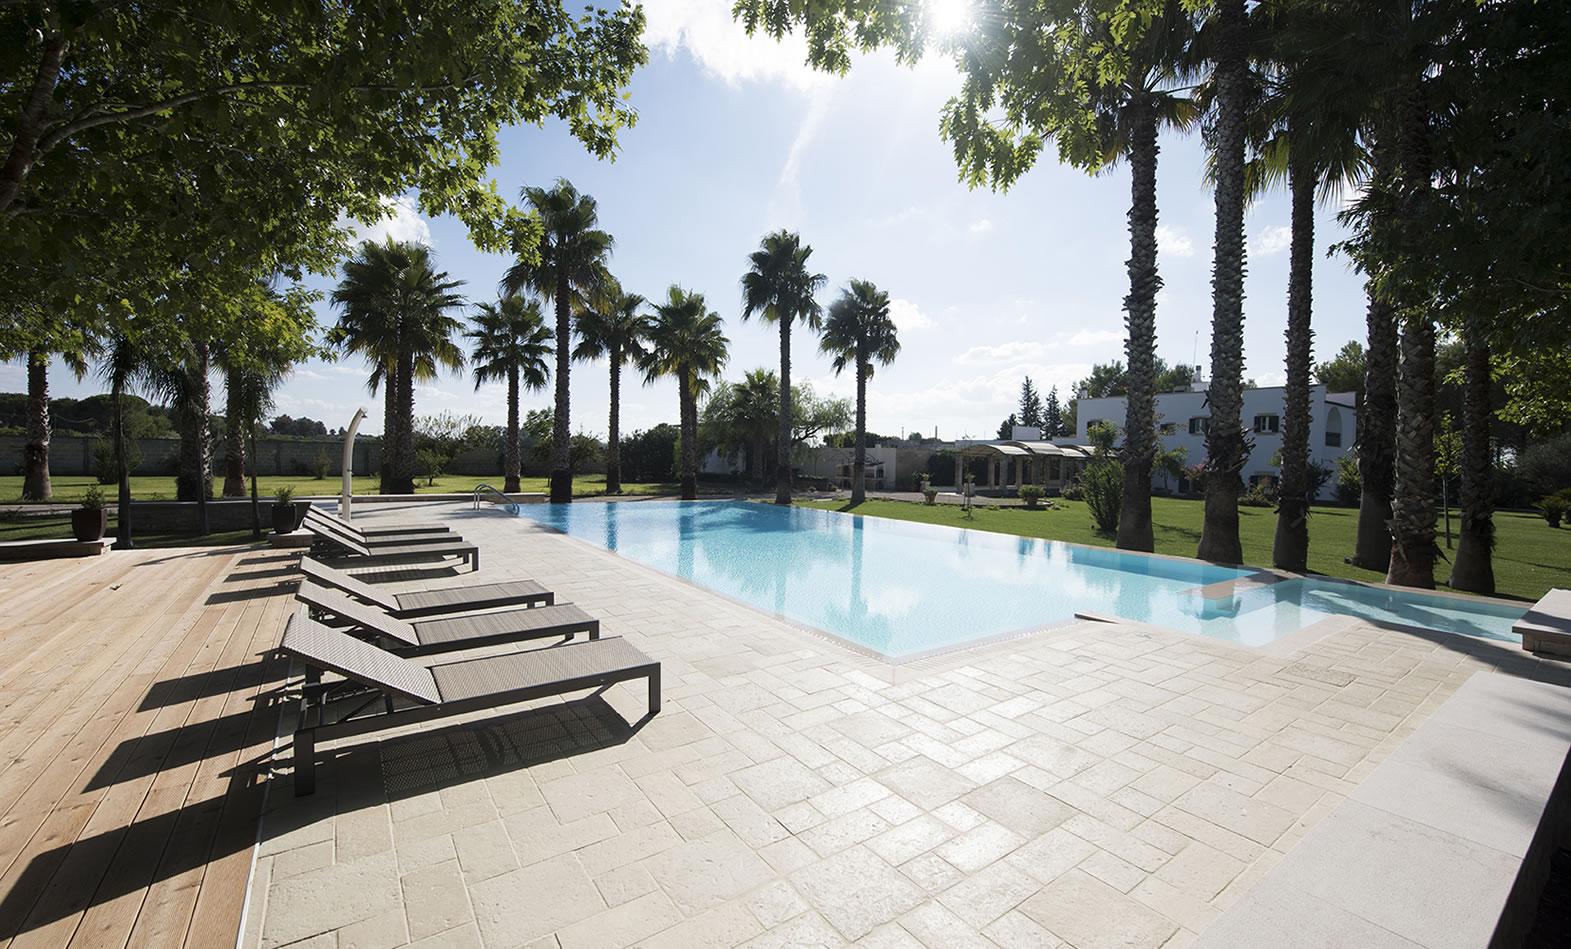 Swimming pool in detached villa